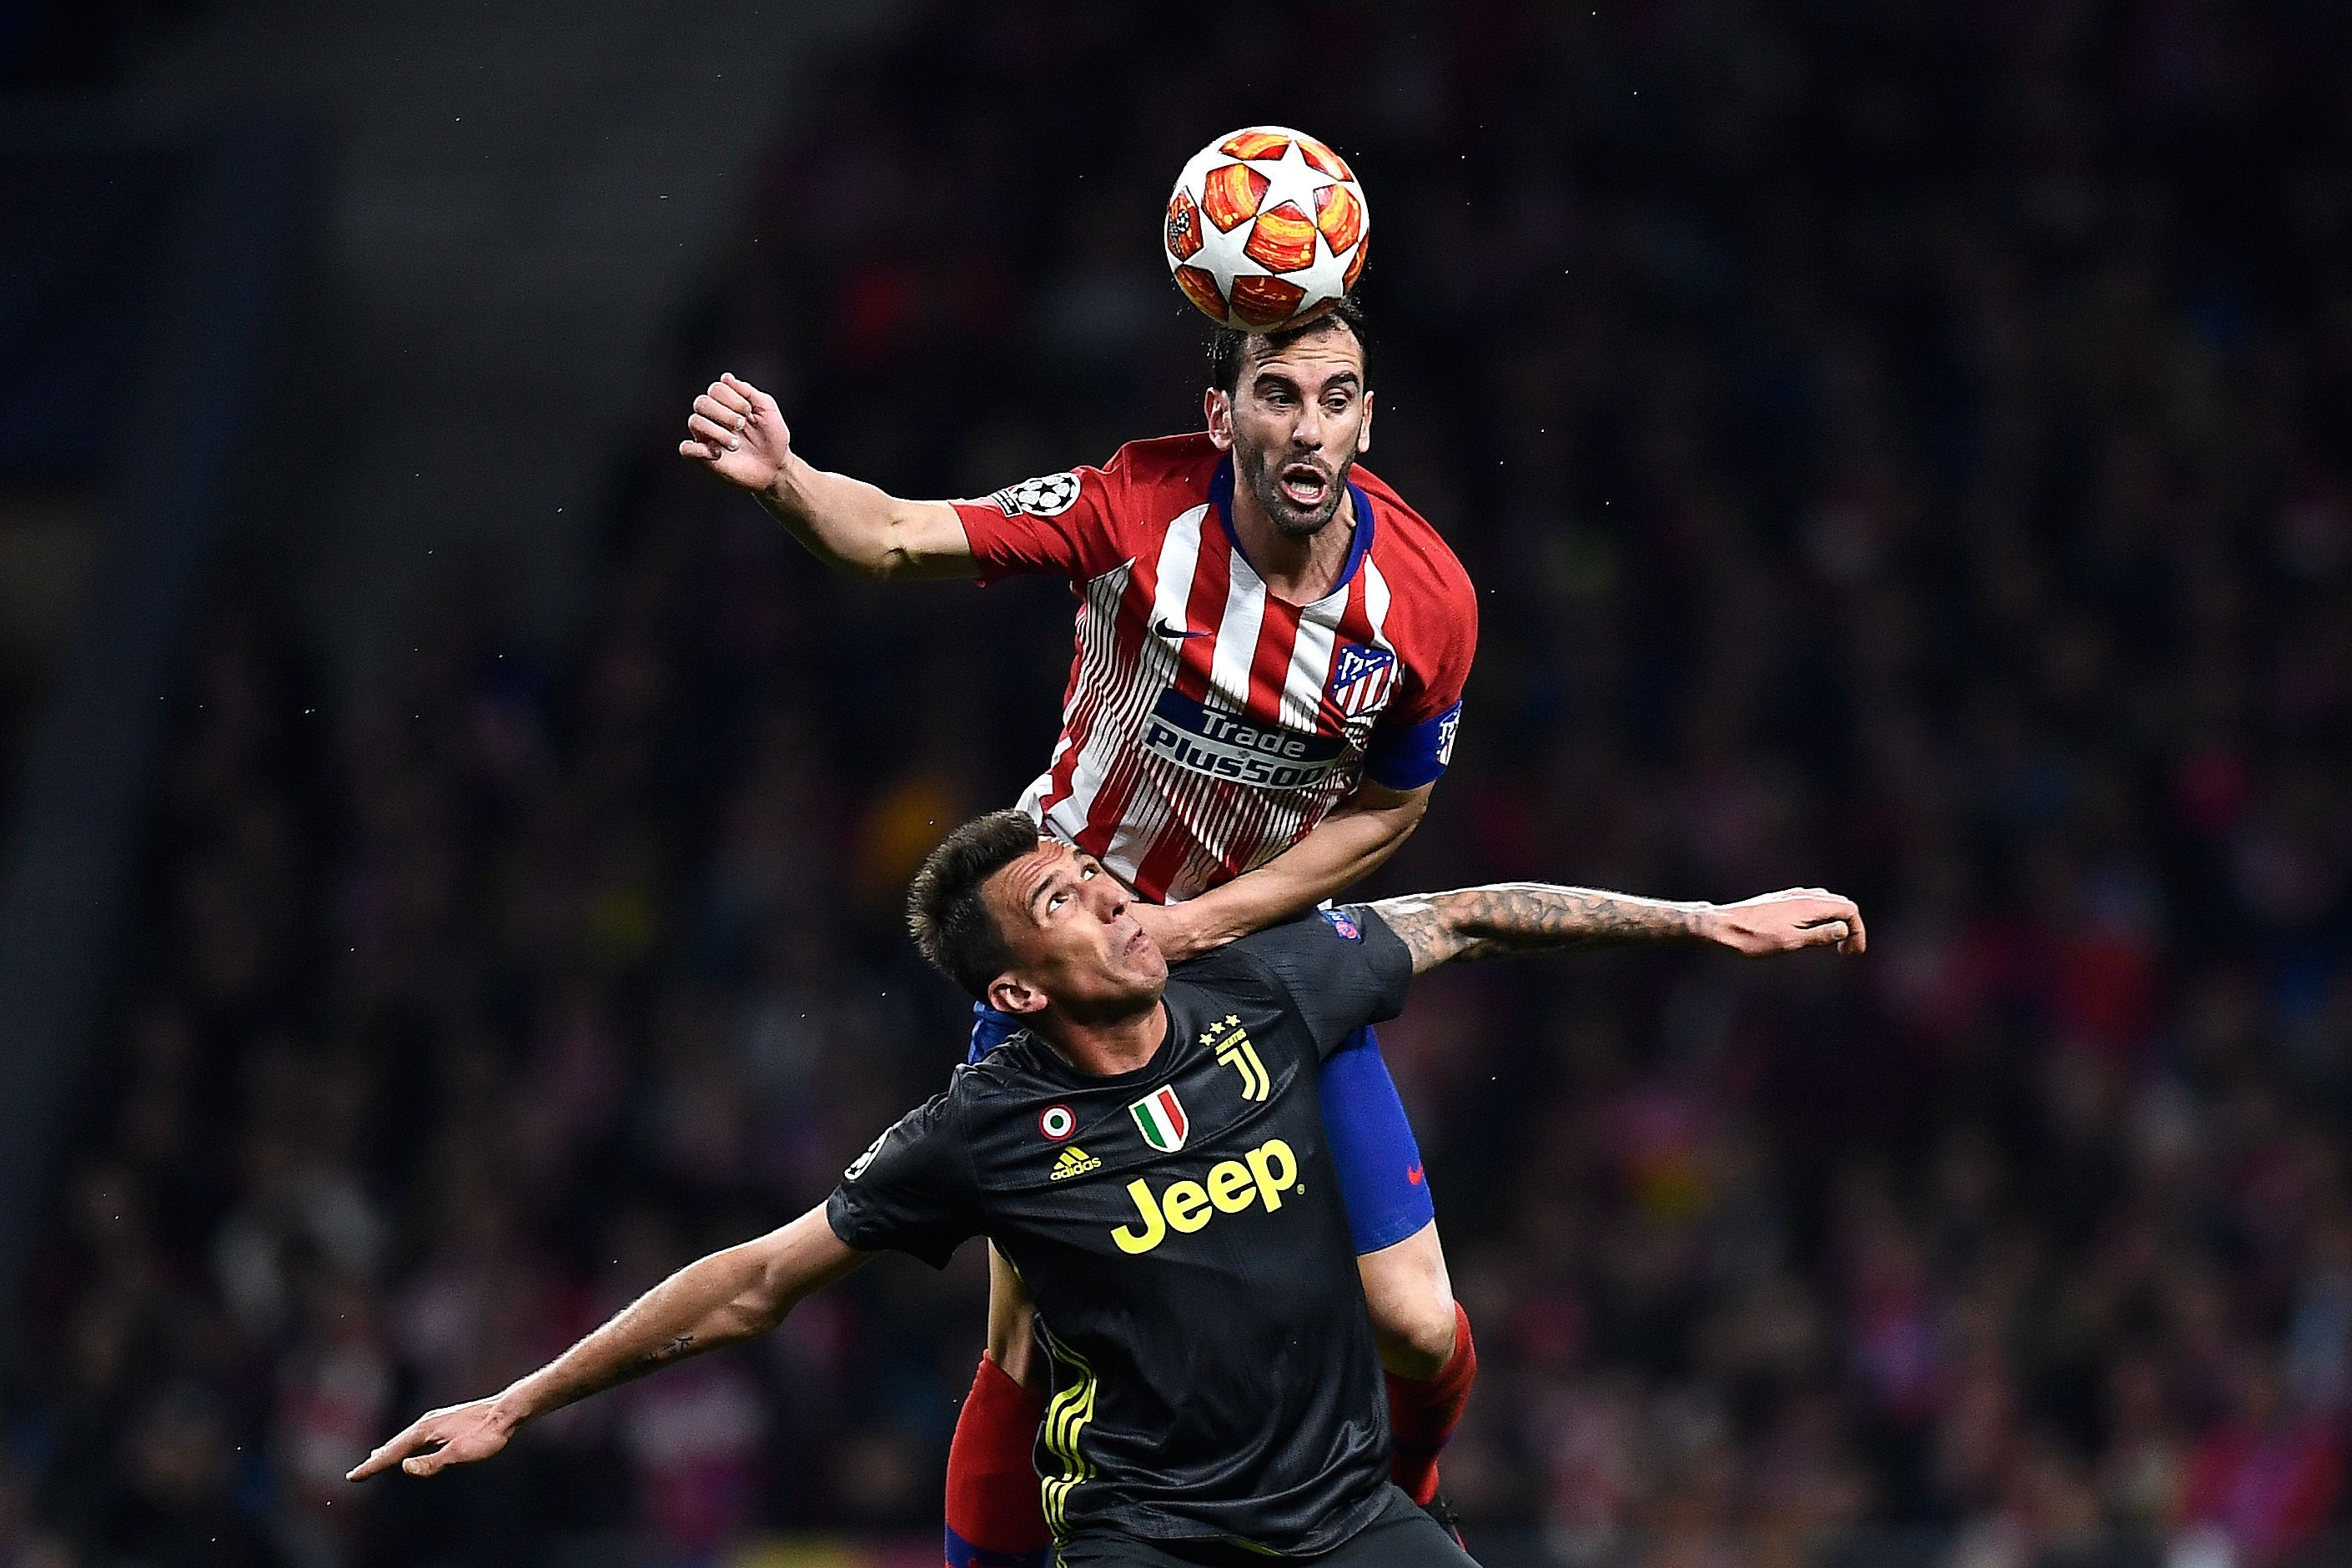 Diego Godín marcó el primer gol